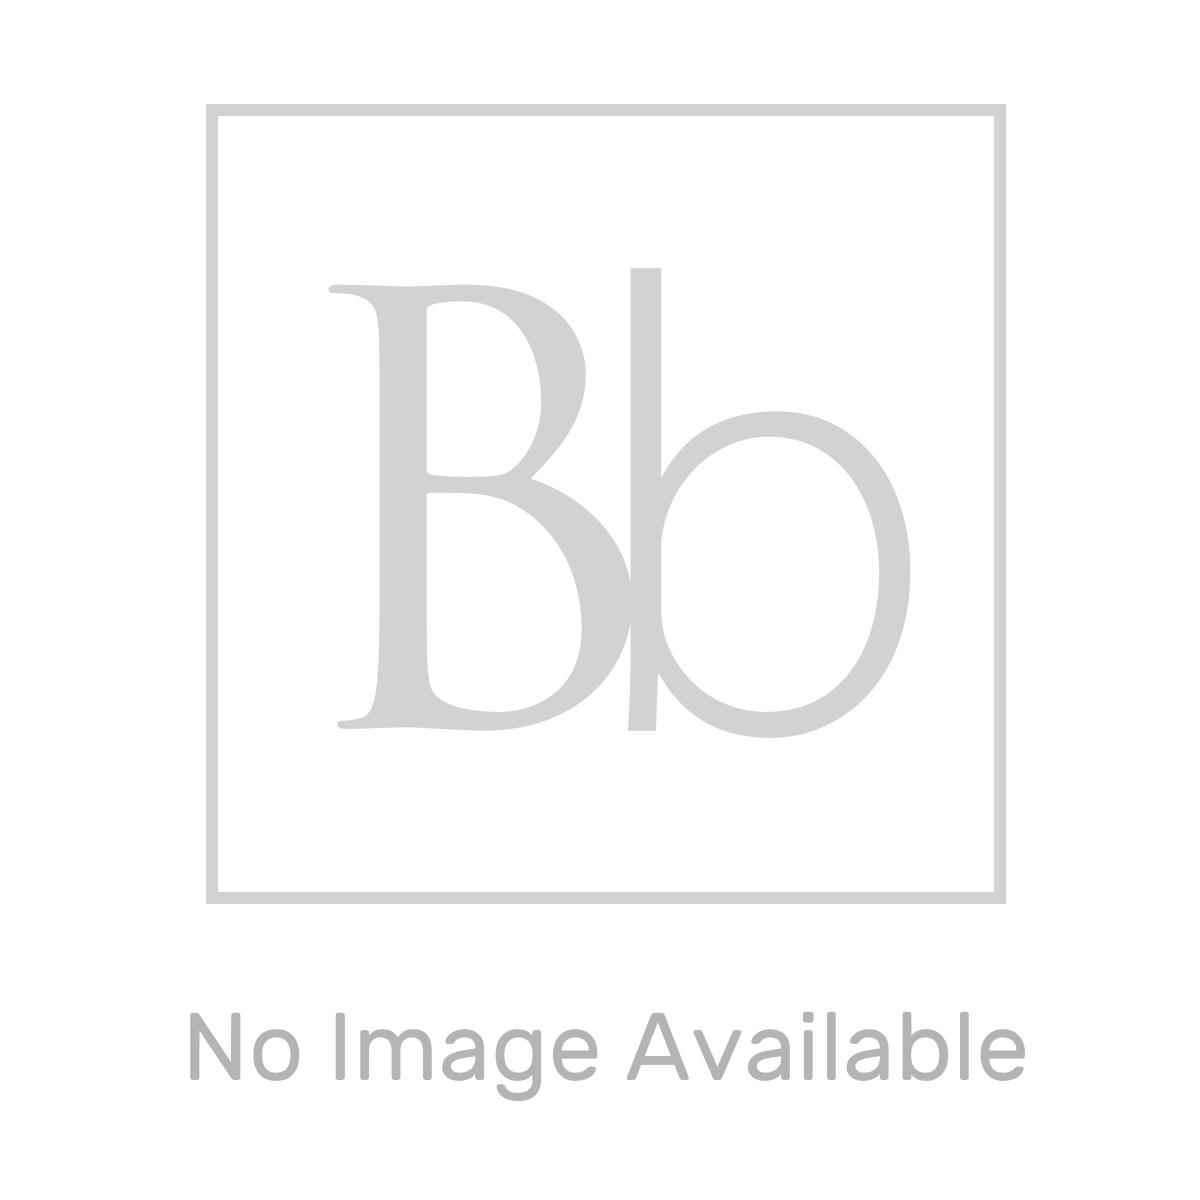 Frontline Aquaglass Velar+ Black Crittal Framed Walk In Shower Enclosure with Towel Rail Overhead